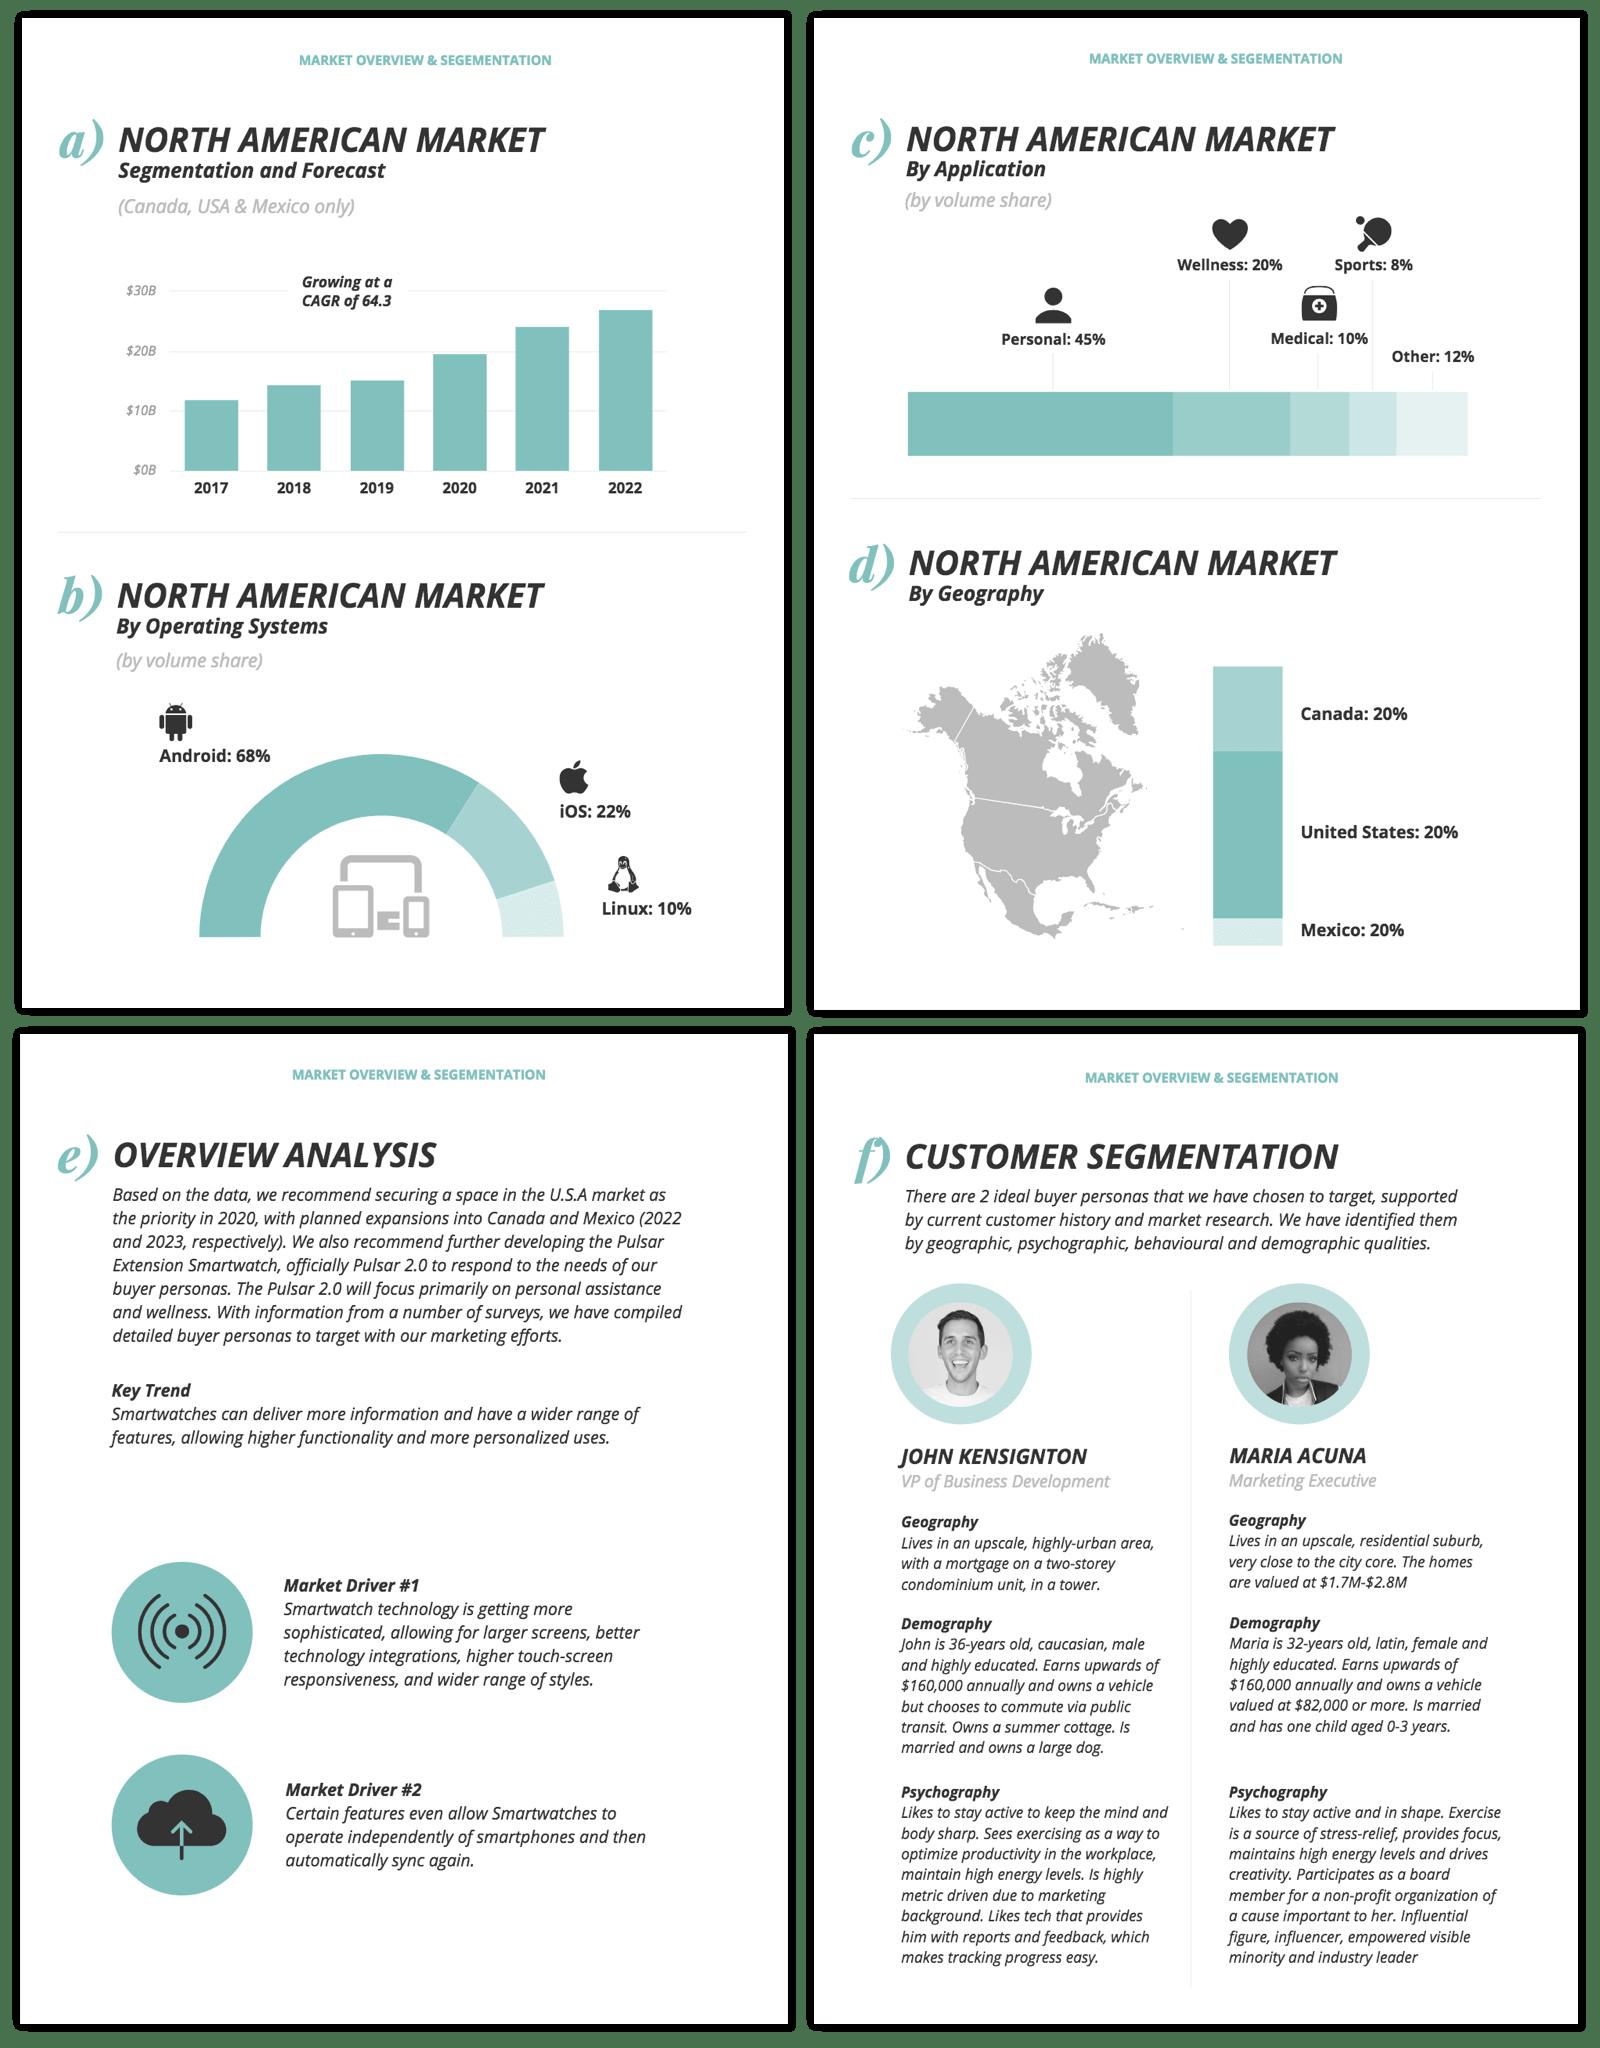 Marketing Analysis Report Marketing Analysis Competitor Analysis Marketing Report